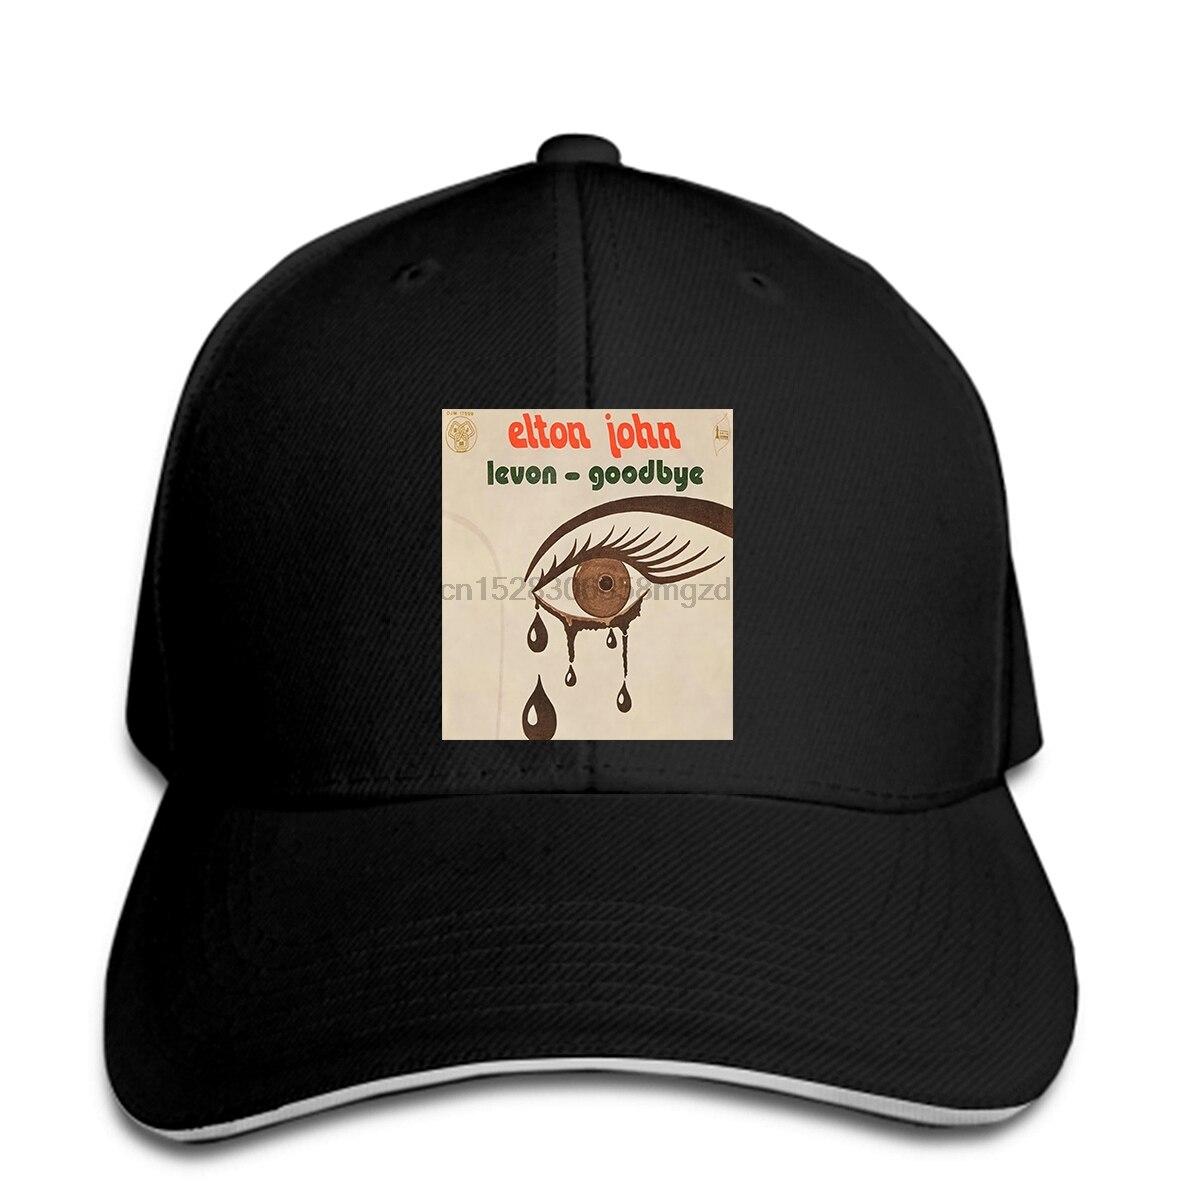 Nuevo ELTON JOHN LEVON adiós gorra Snapback mujeres sombrero pico